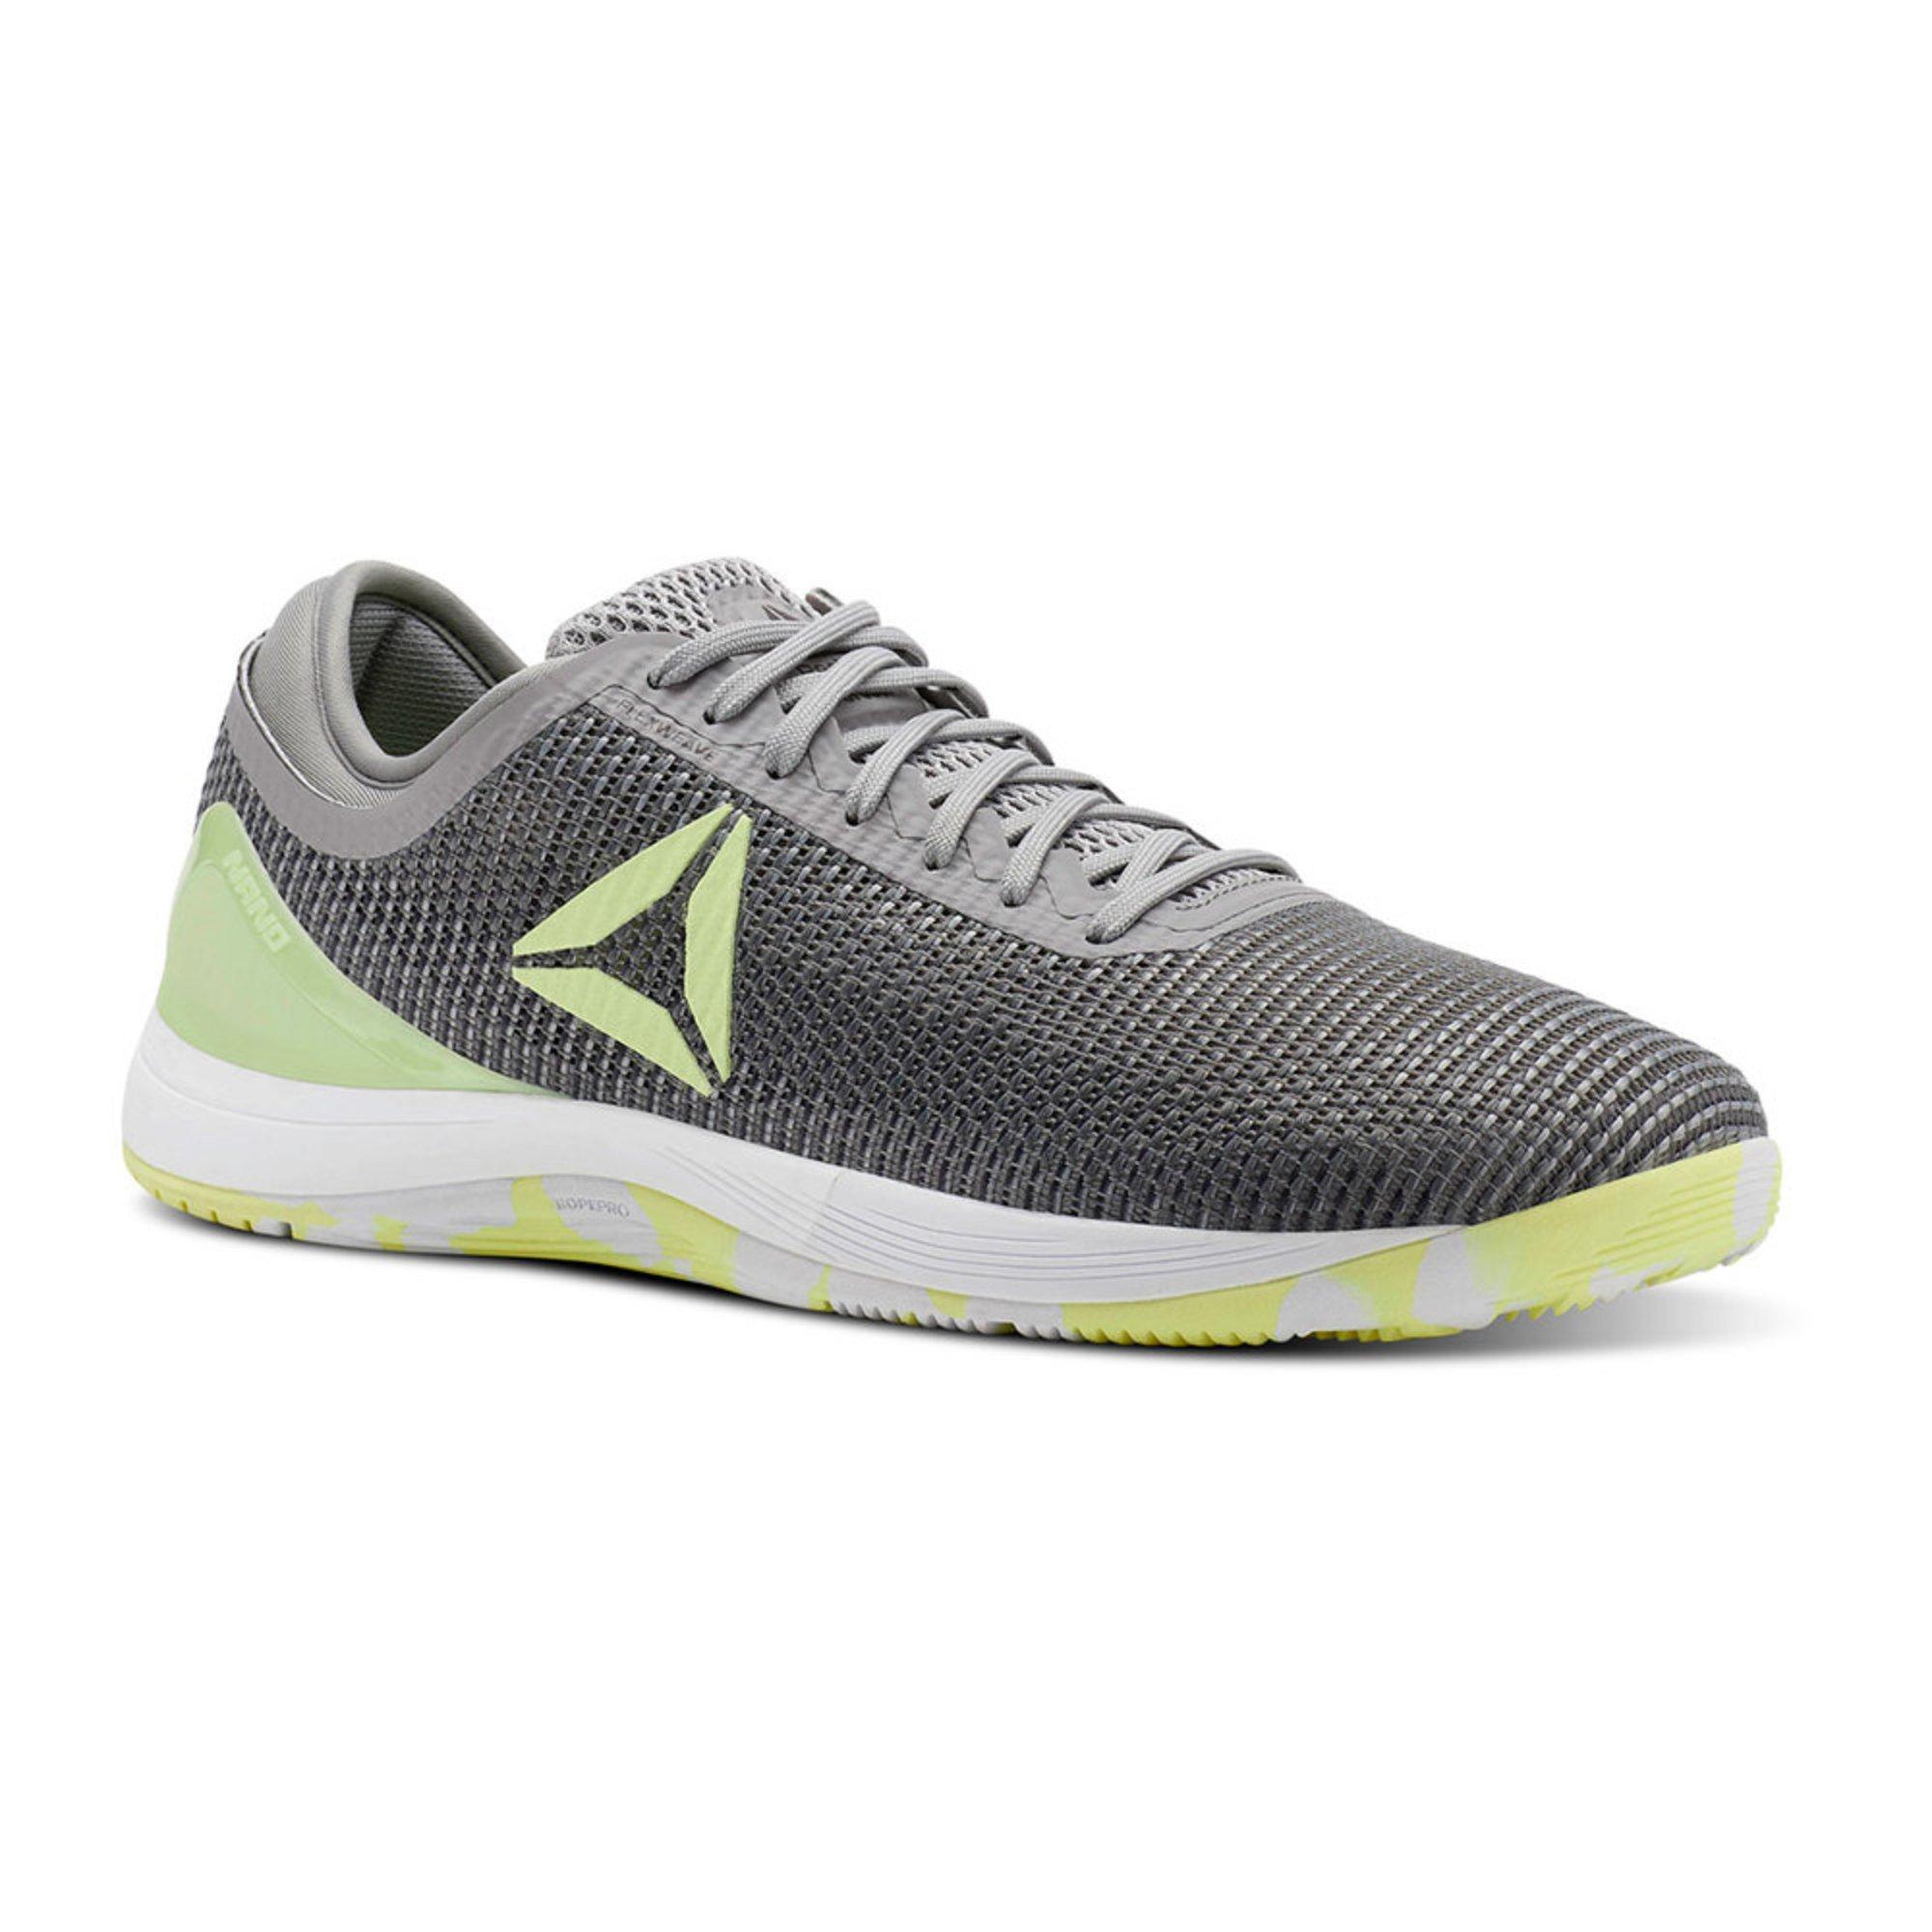 Reebok Men s Crossfit Nano 8.0 Crossfit Training Shoe  5da5a878b